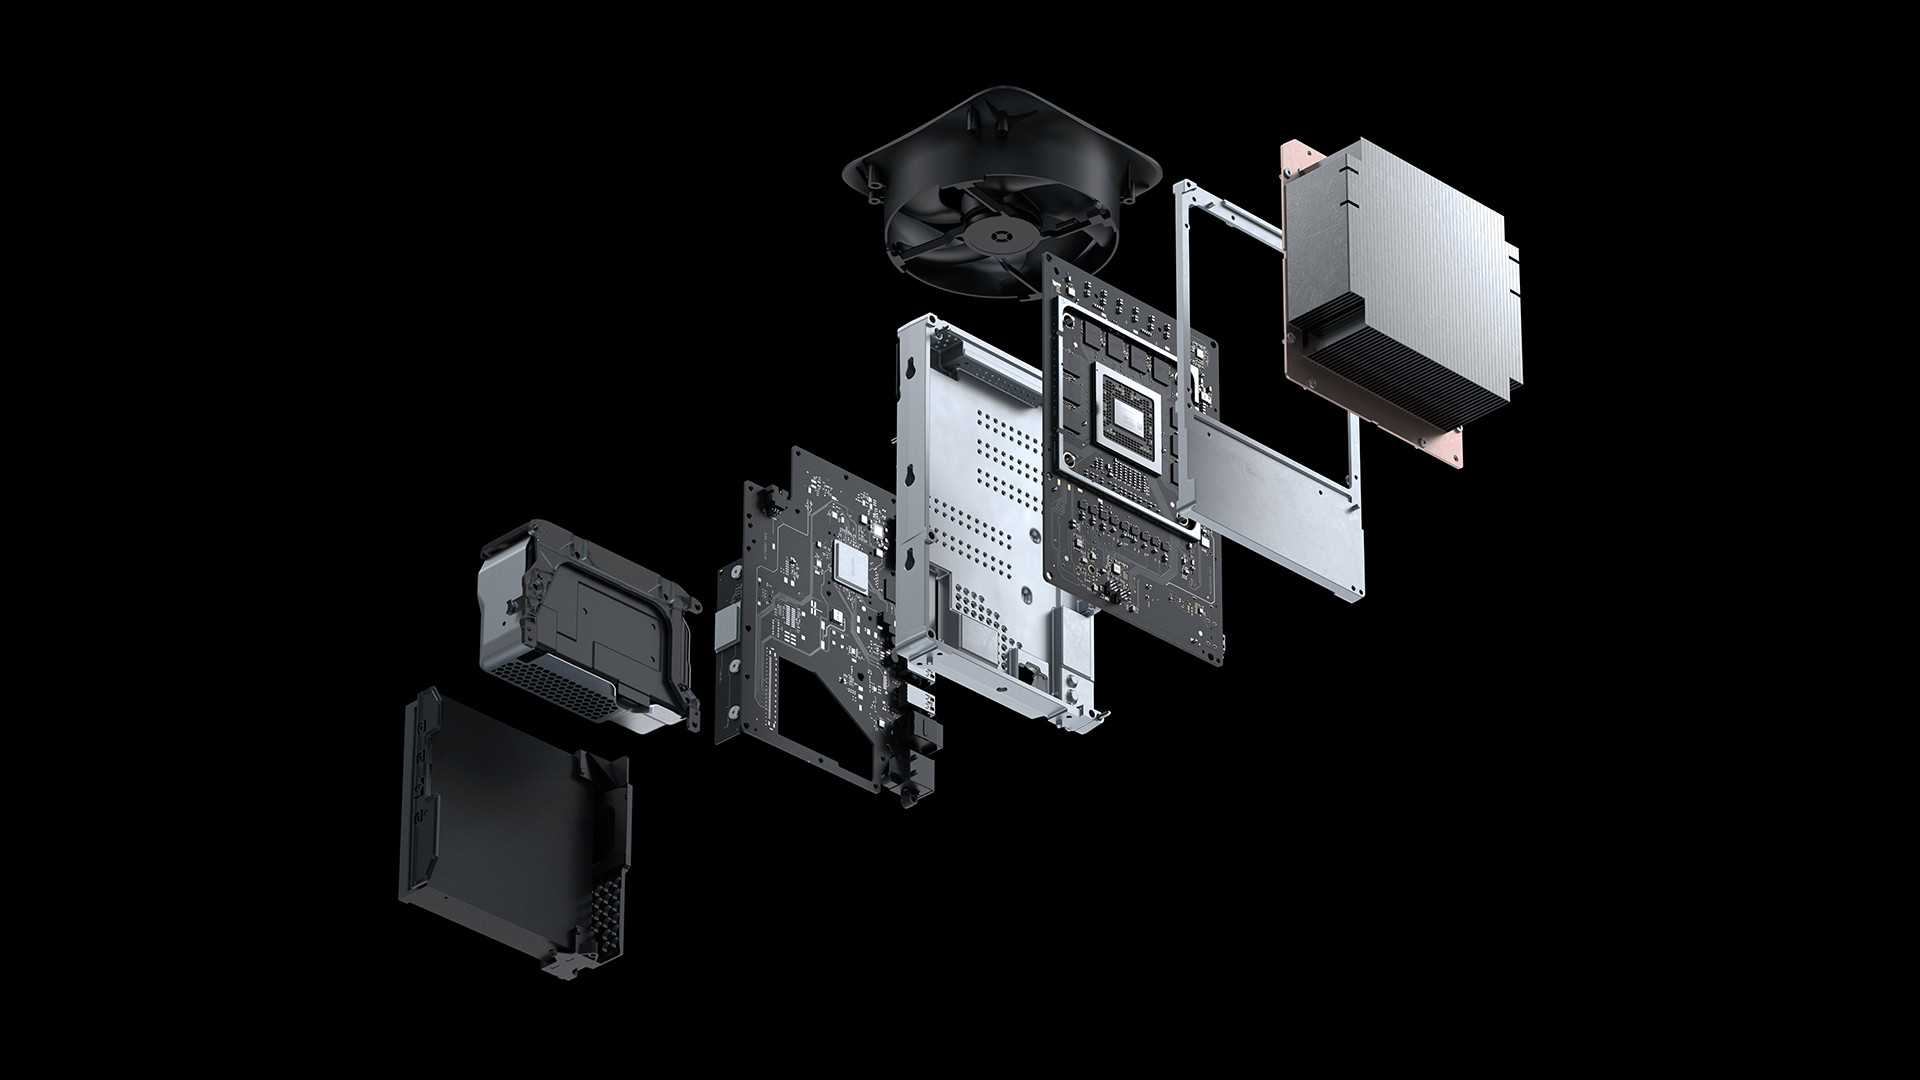 xbox series x hardware